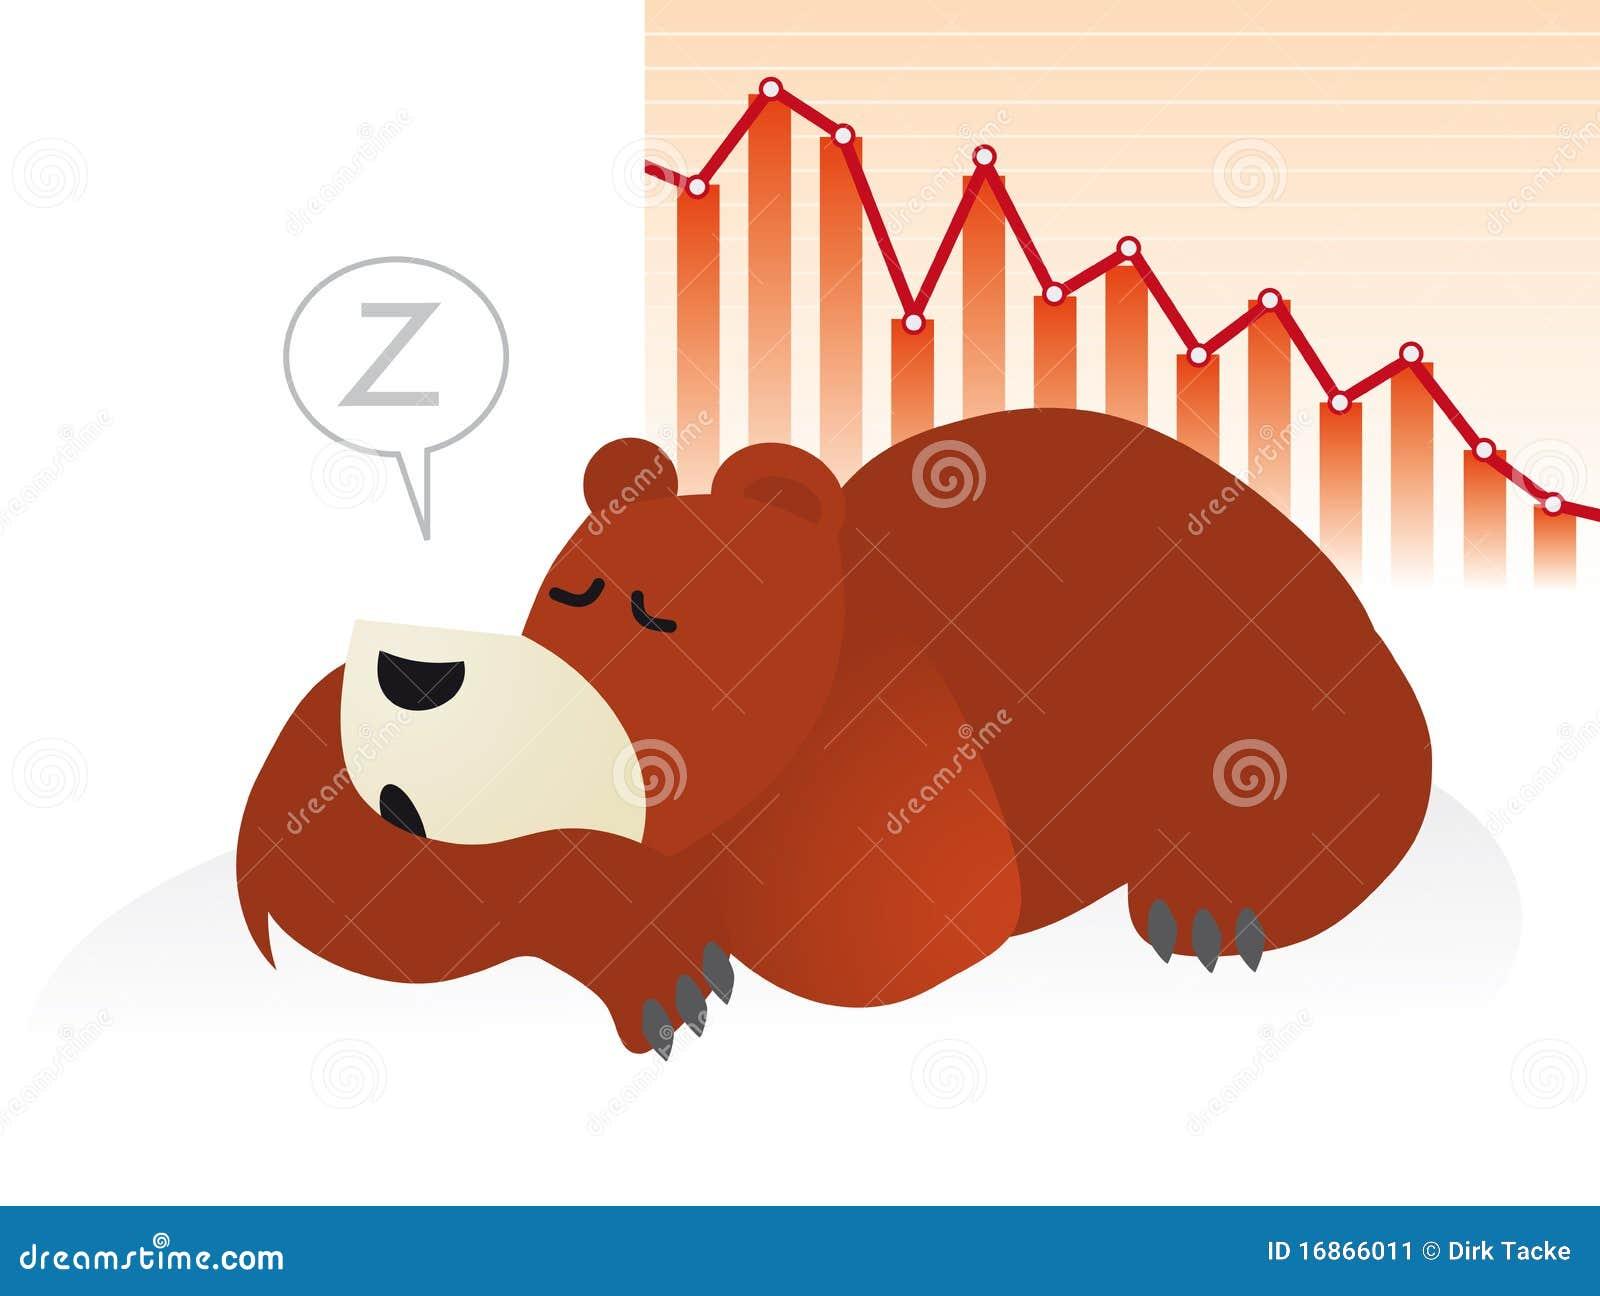 Mercado de urso: sono na frente do estoque financeiro